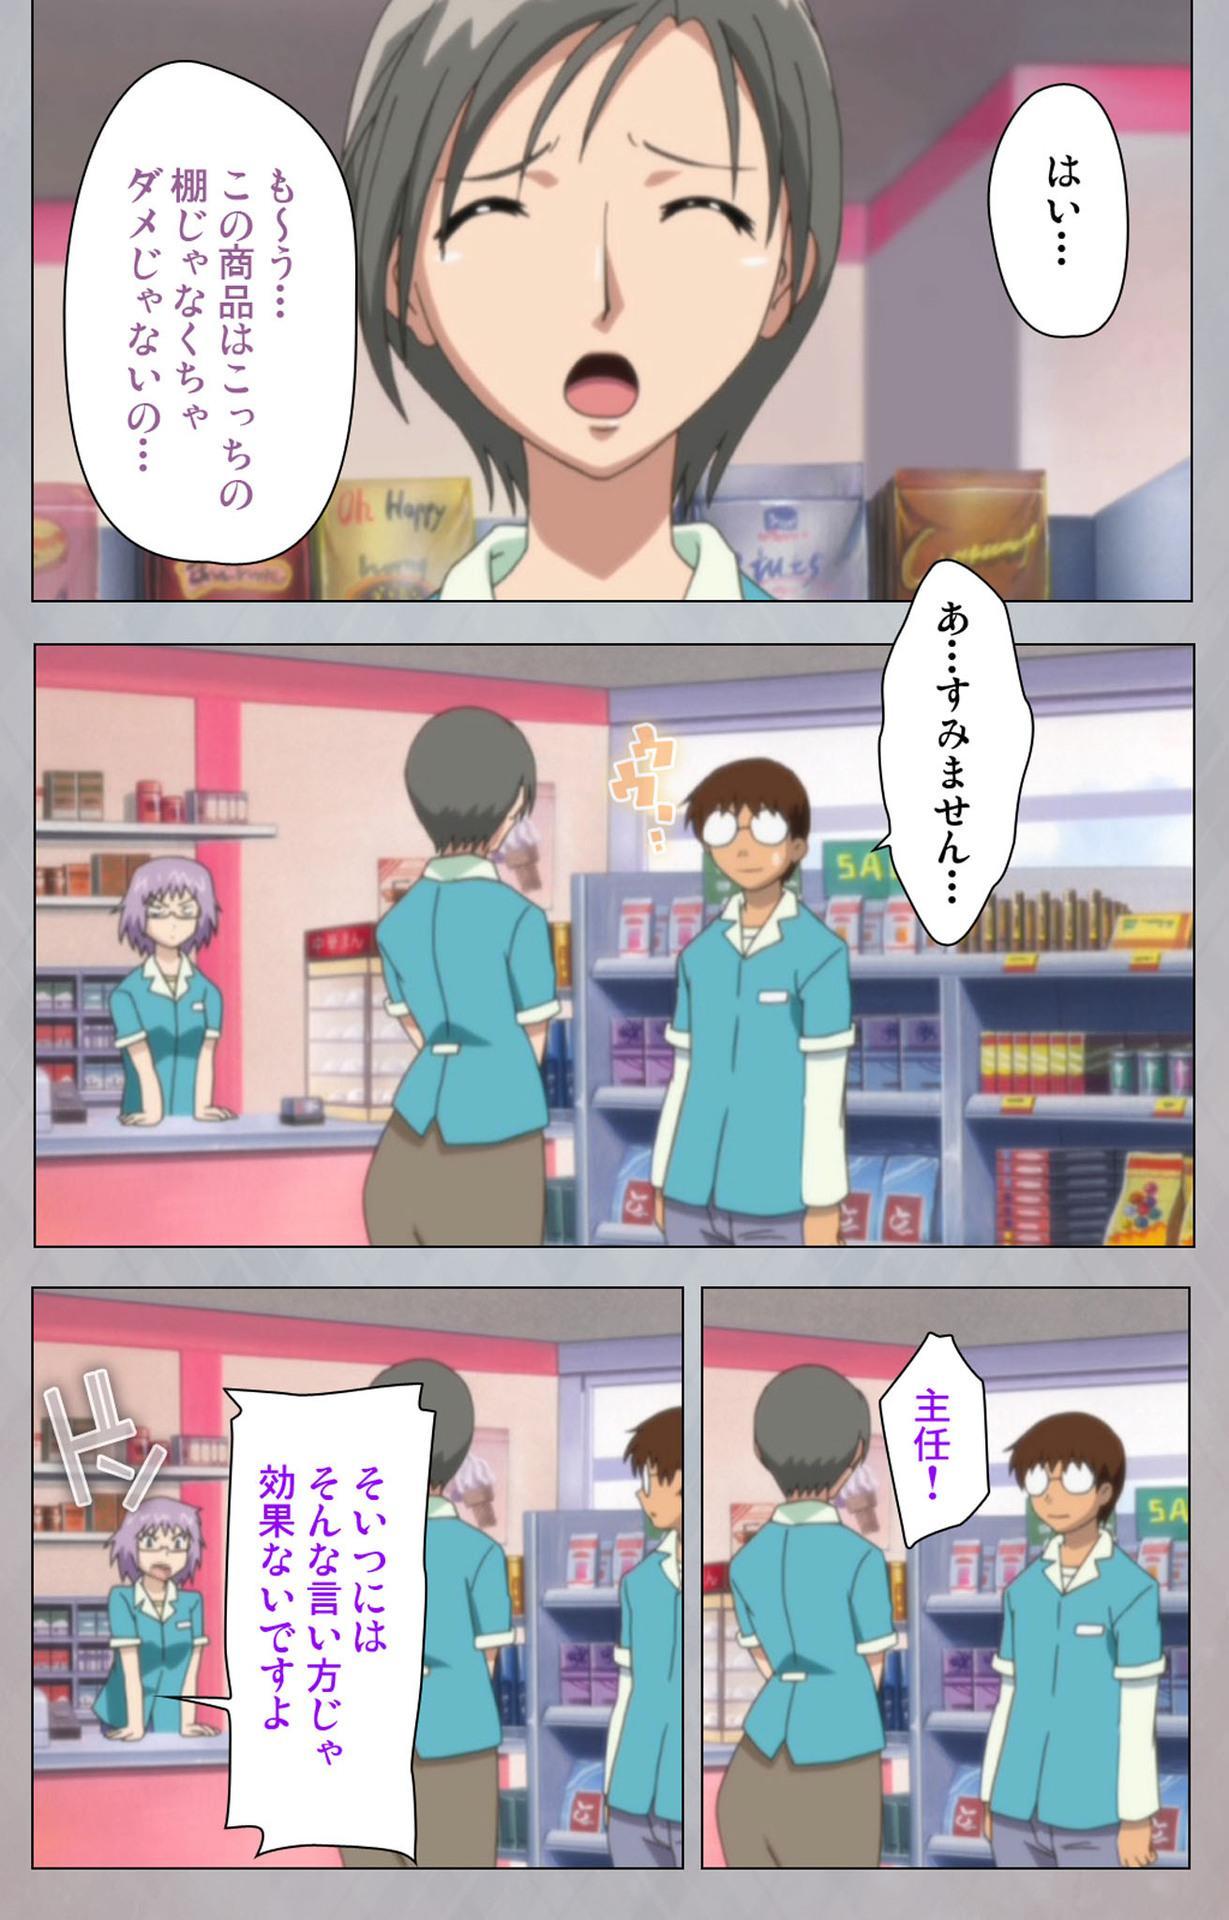 [Digital Works] [Full Color Seijin Ban] Sex Android ~Risou no Onna de Nuite yaru~ Kanzenban 5